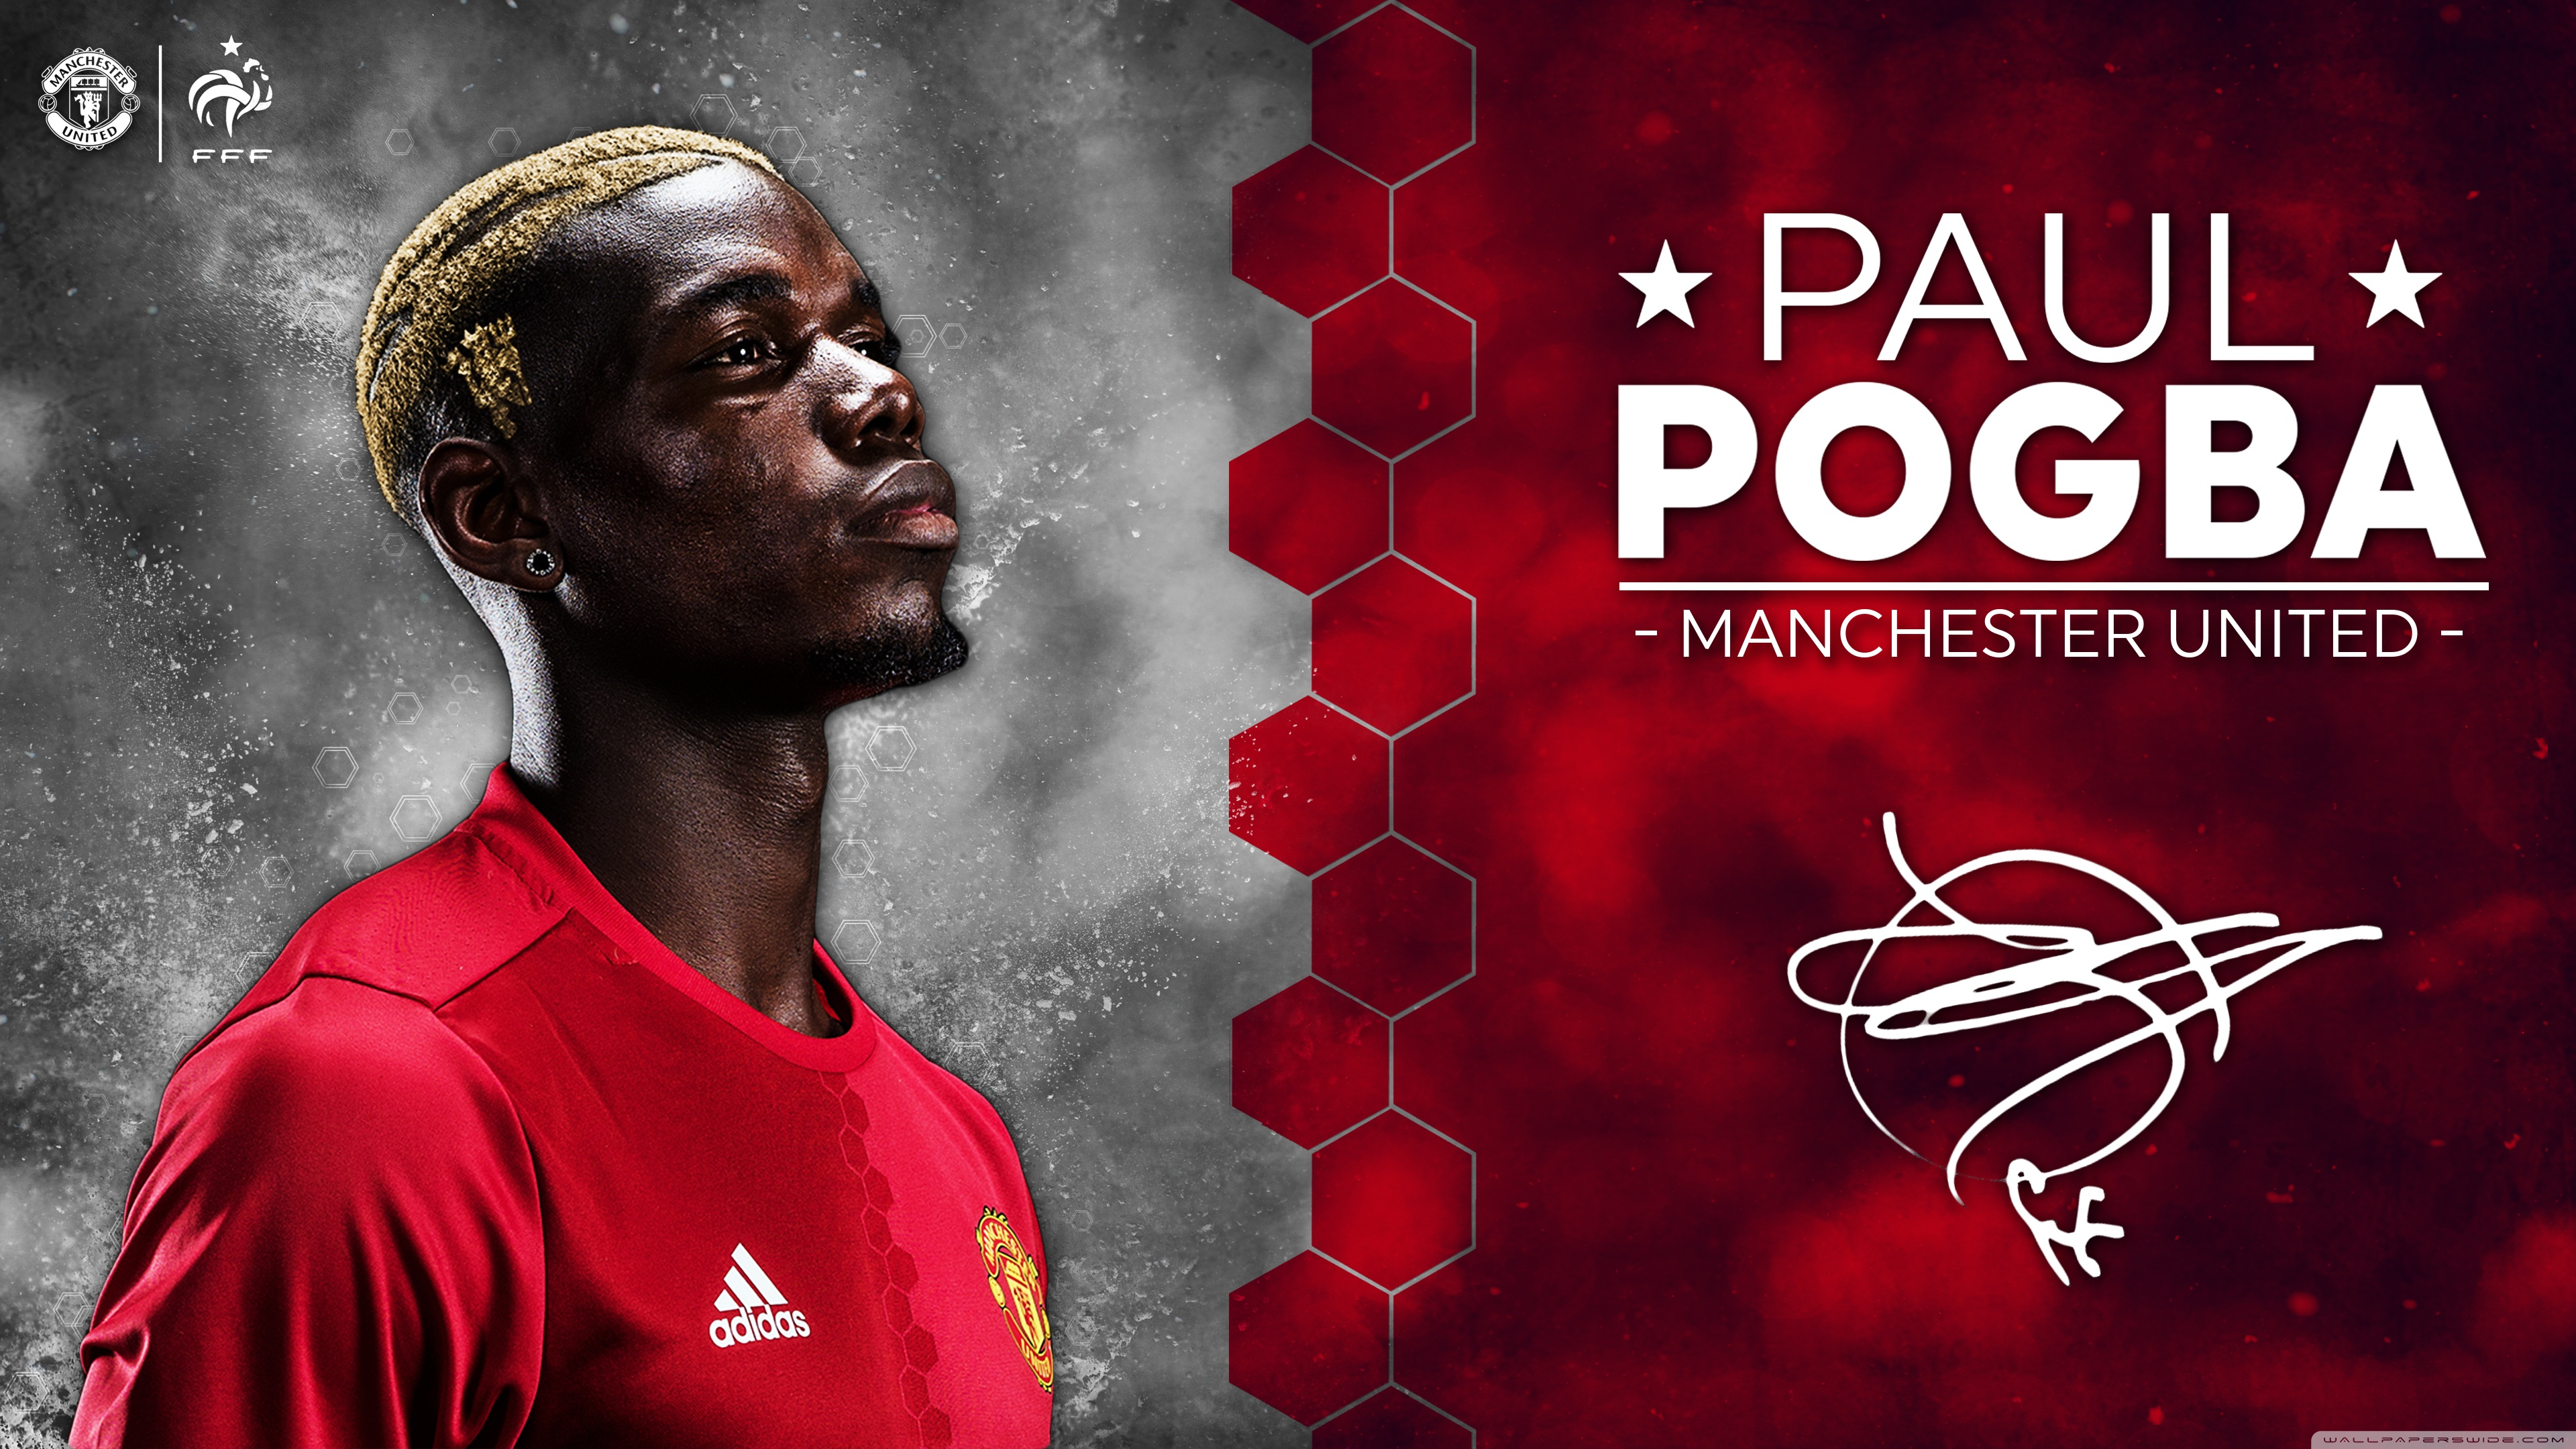 Paul Pogba Manchester United 2016 17 4K HD Desktop Wallpaper 3840x2160